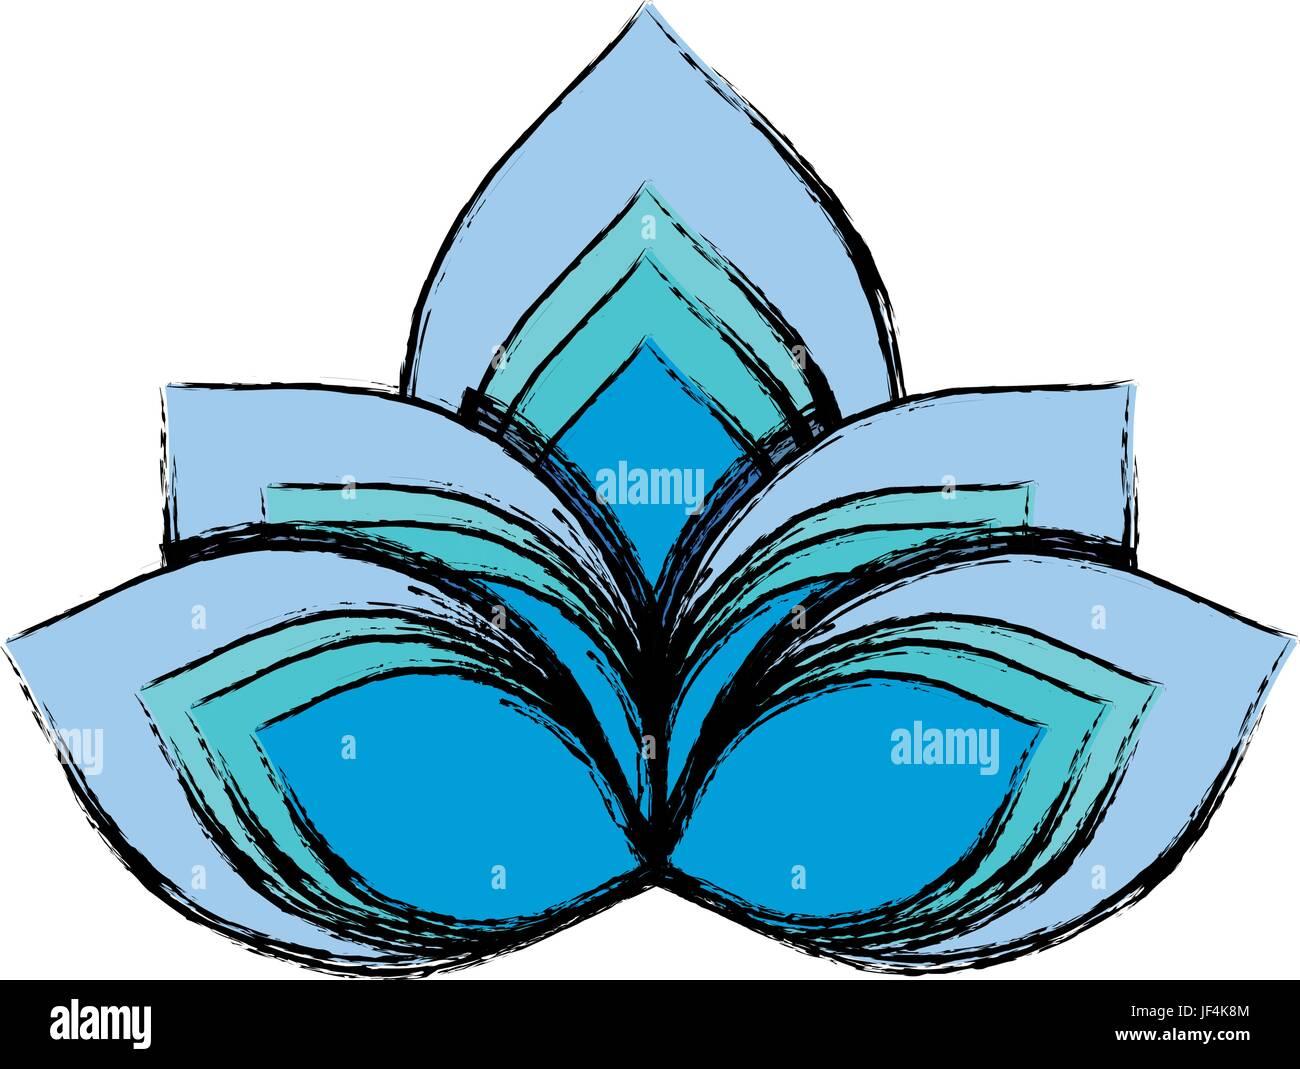 Lotus flower symbol stock vector art illustration vector image lotus flower symbol mightylinksfo